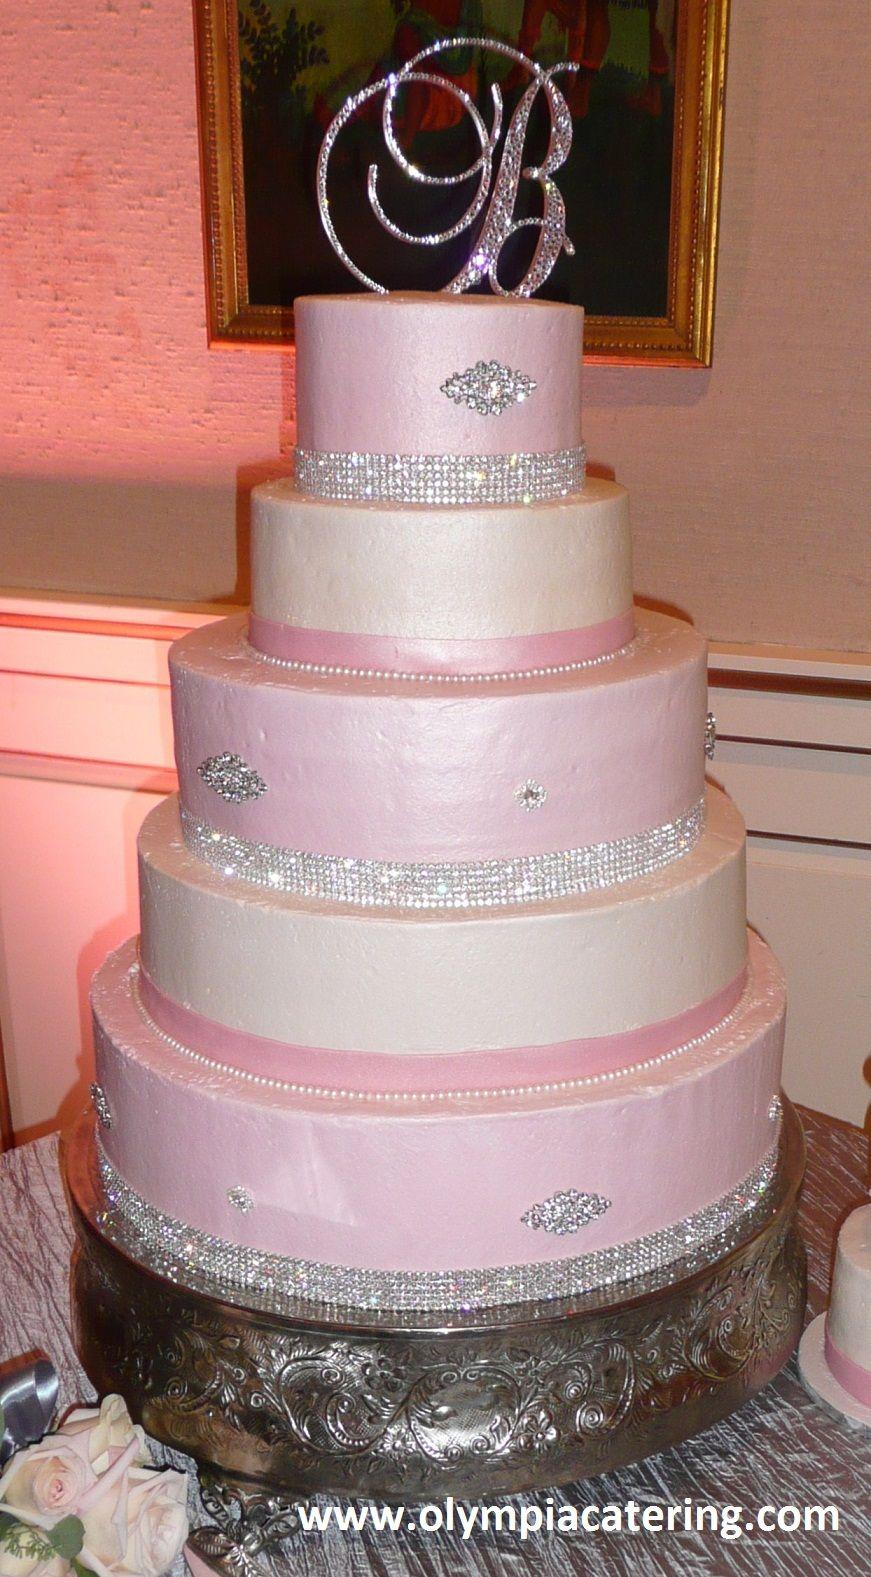 Round Wedding Cake, Light Pink and White Icing, Diamond ...